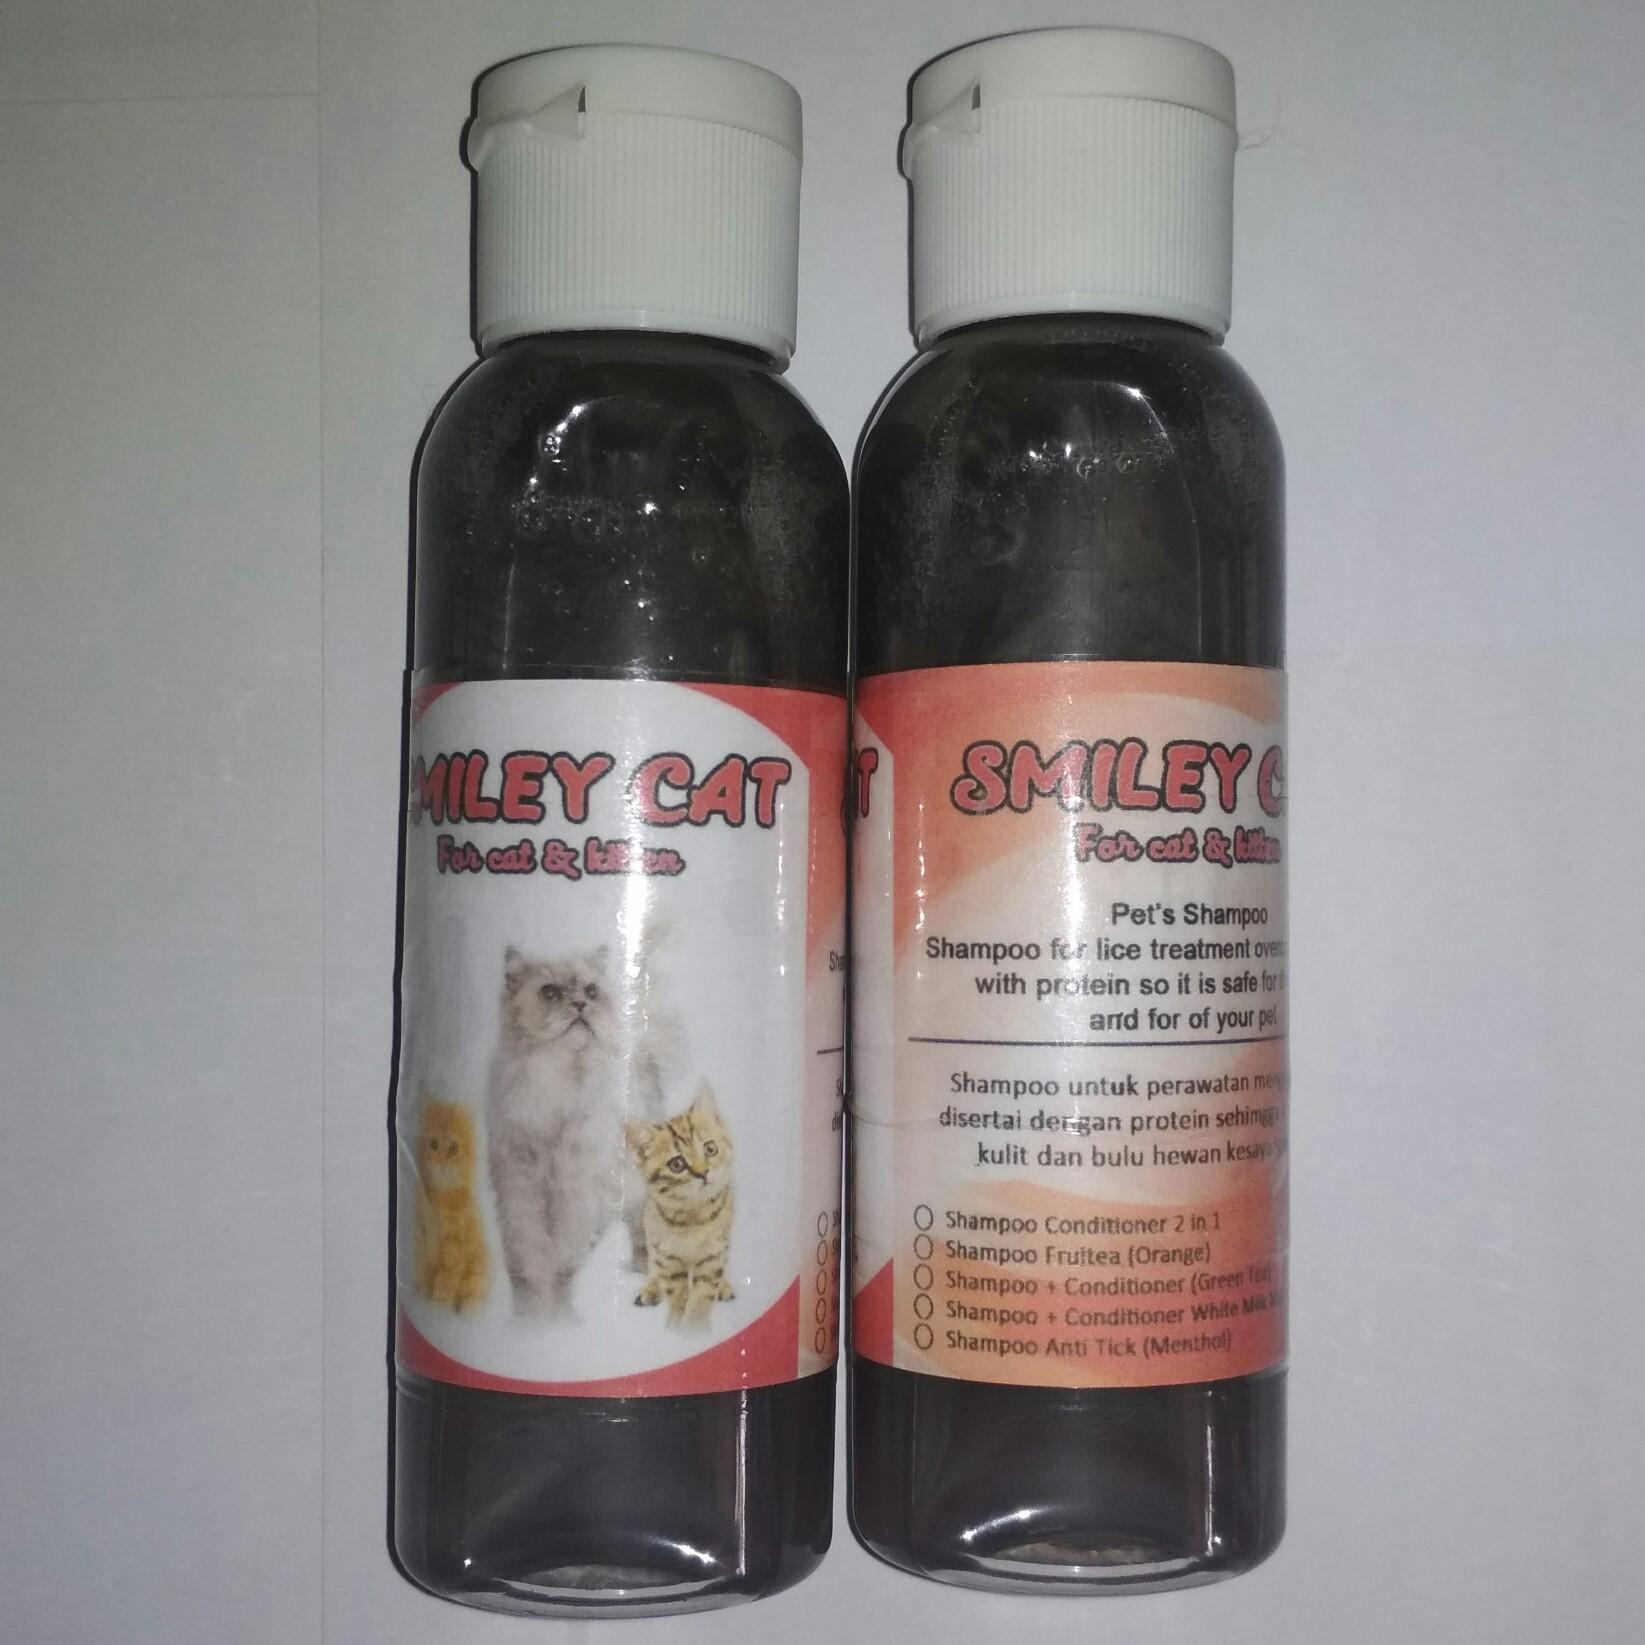 Jual Sampo Kucing Terbaik Shampo Anti Kutu Lice Shampoo Dan Anjing Jamur 100 Ml Wangi Asian Flowers